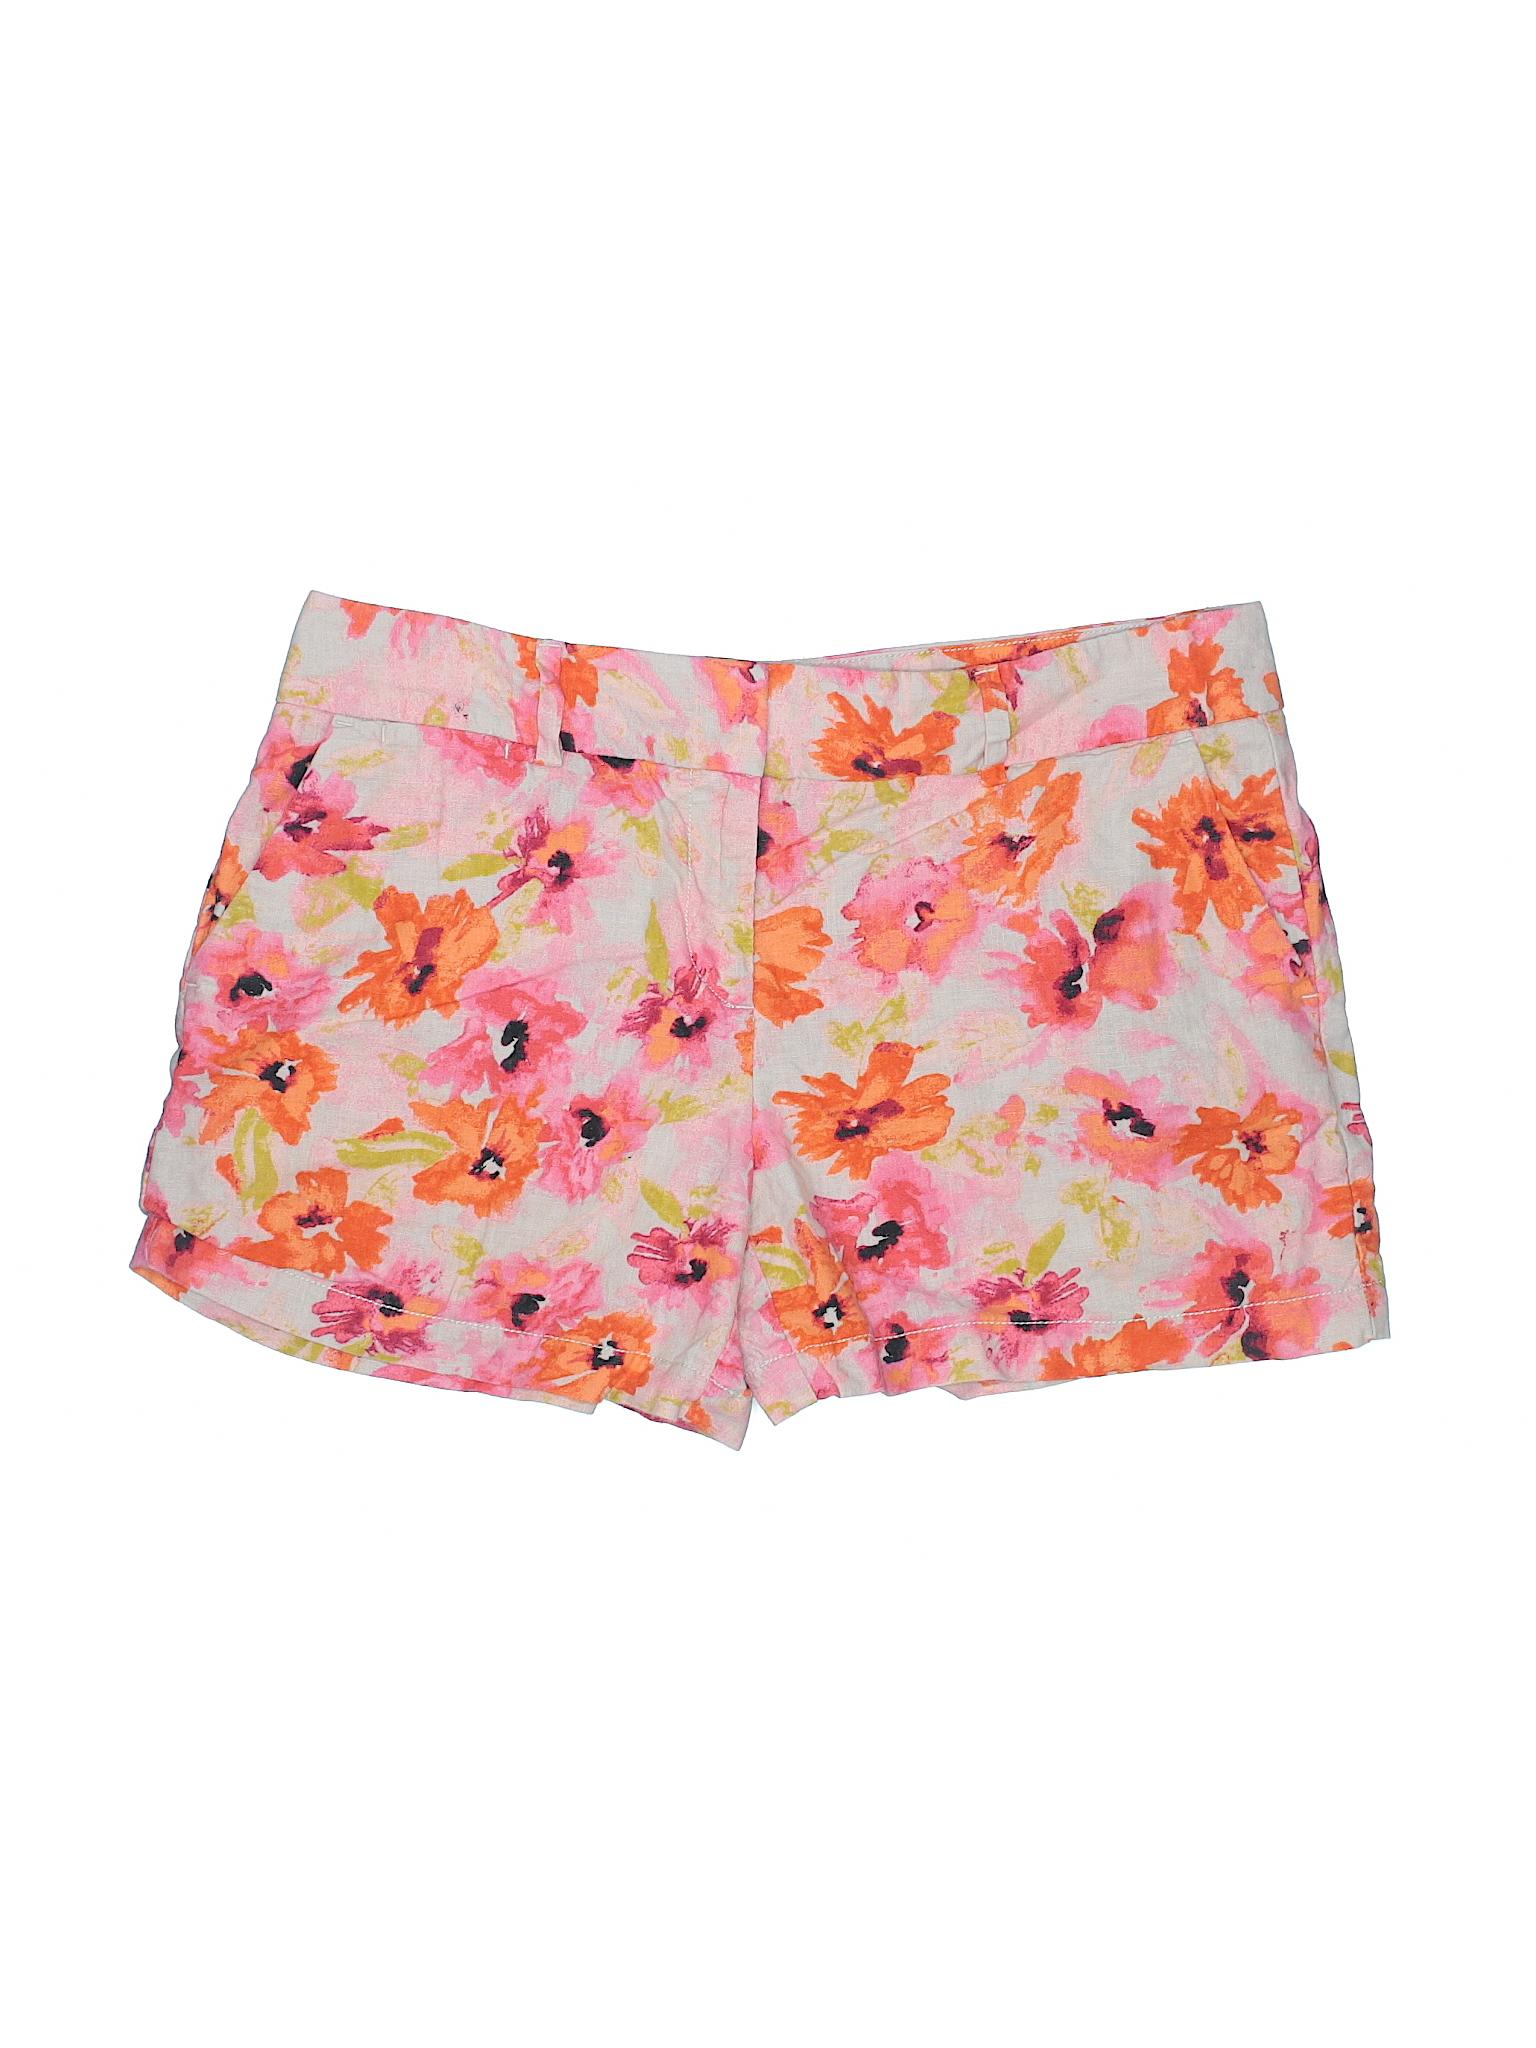 Khaki Taylor Ann Shorts LOFT Boutique Uq40xnYU